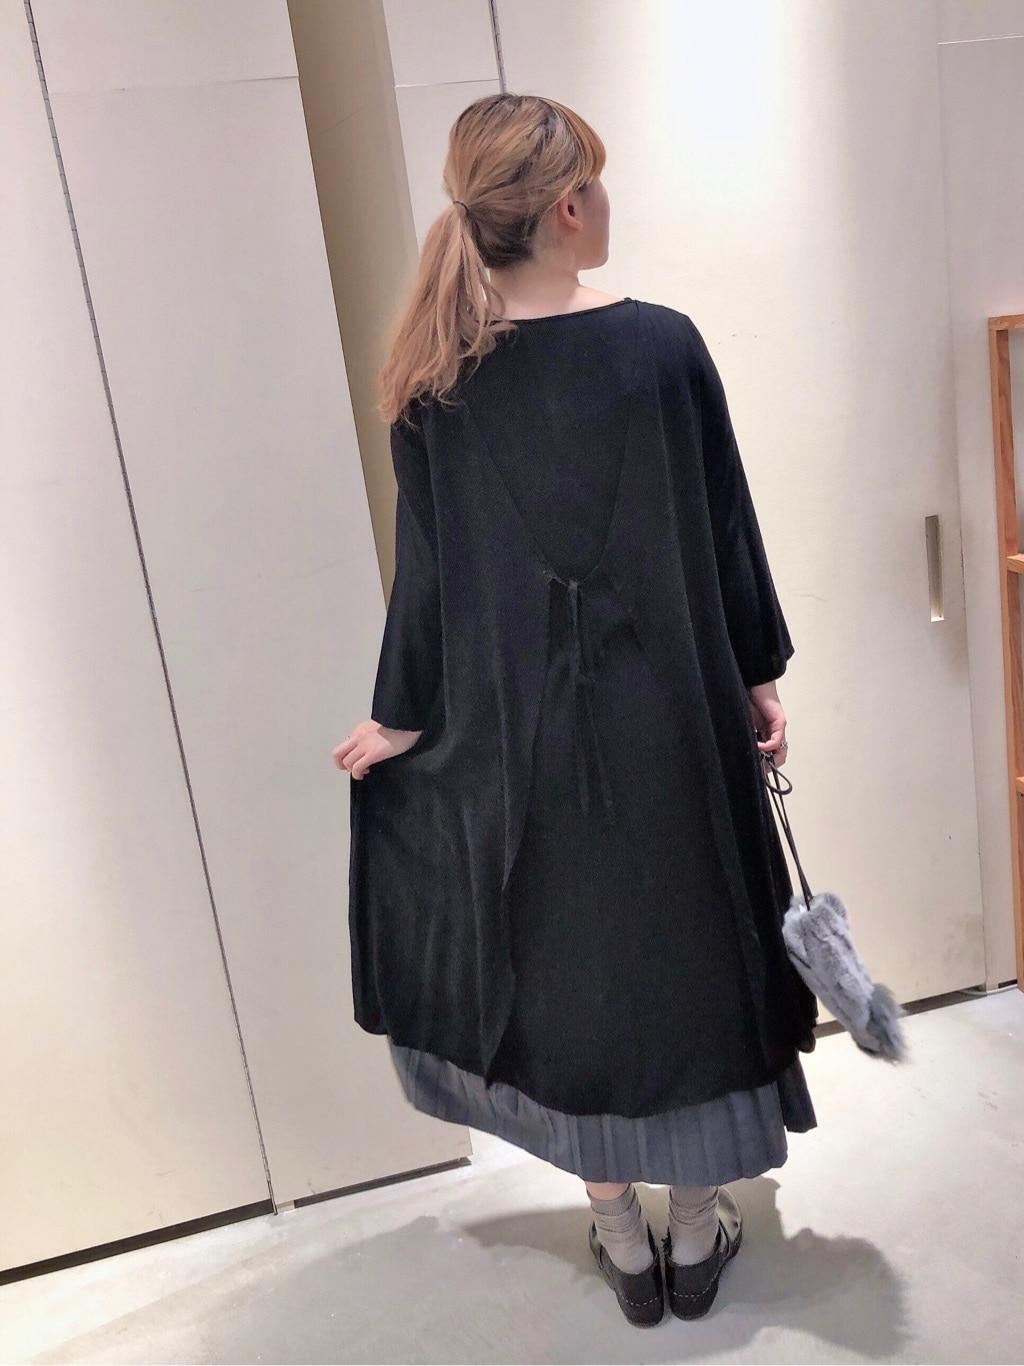 bulle de savon 阪急西宮ガーデンズ 身長:166cm 2019.12.04